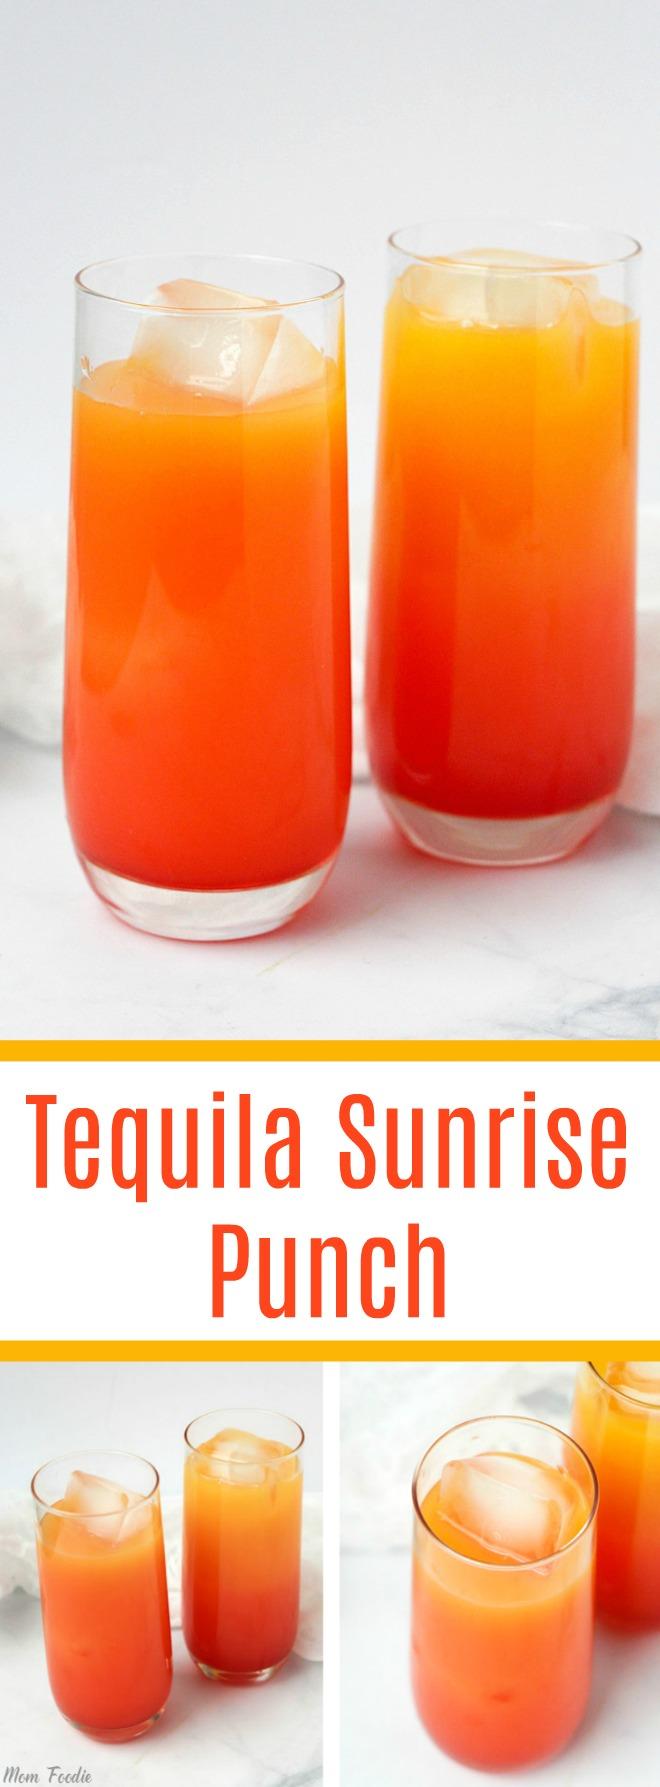 Tequila Sunrise Punch